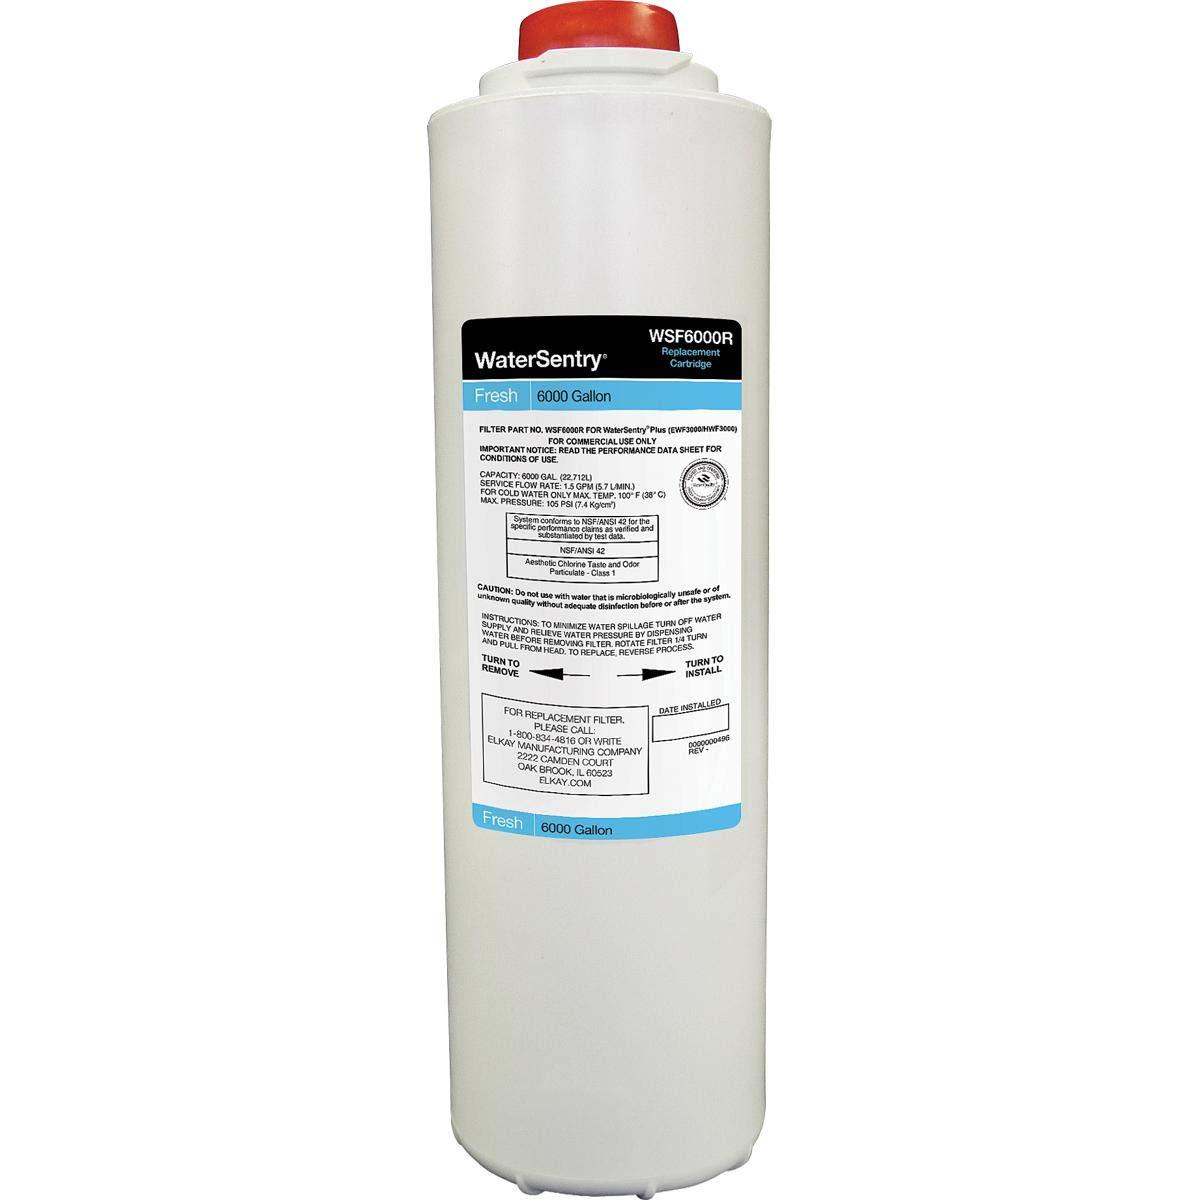 Elkay WSF6000R-2PK WaterSentry Fresh 6000 CTO Filter Replacement, 2-Pack